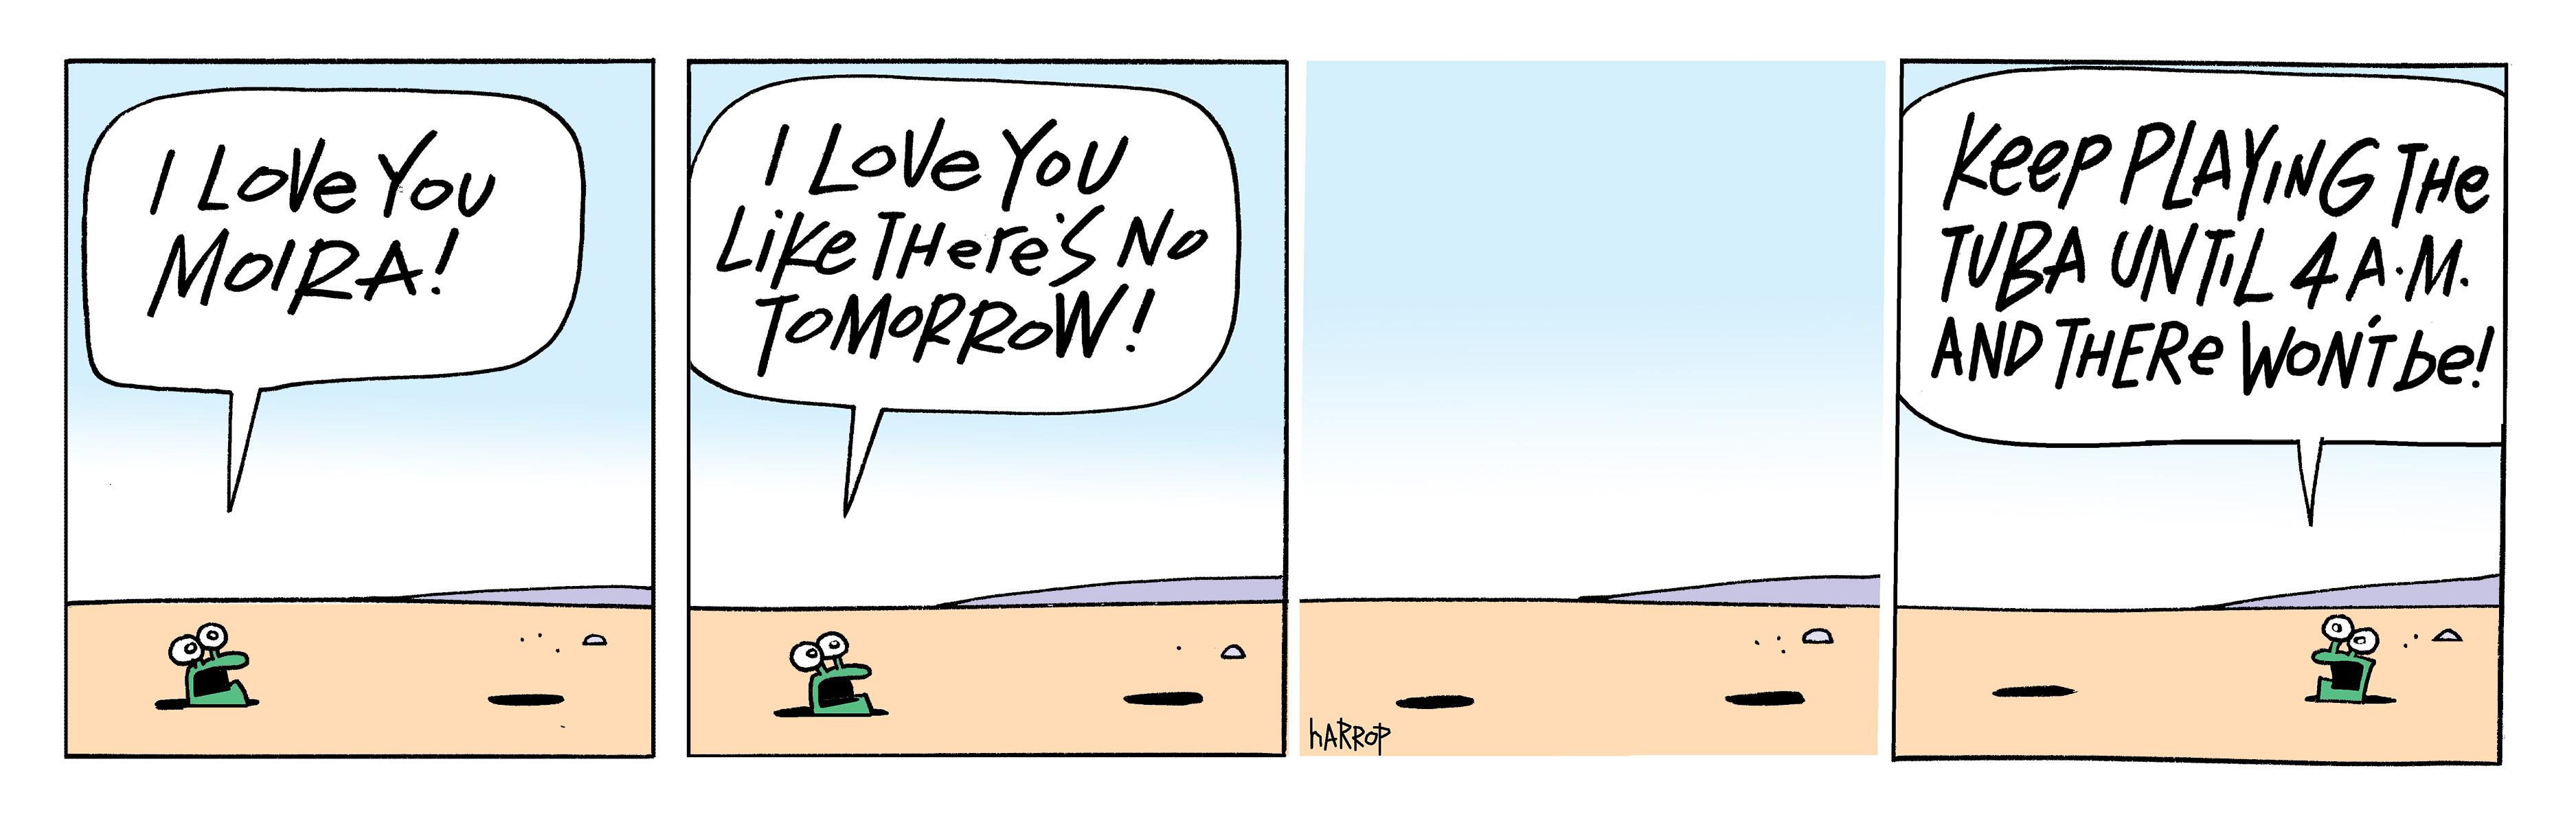 UFO Wednesday